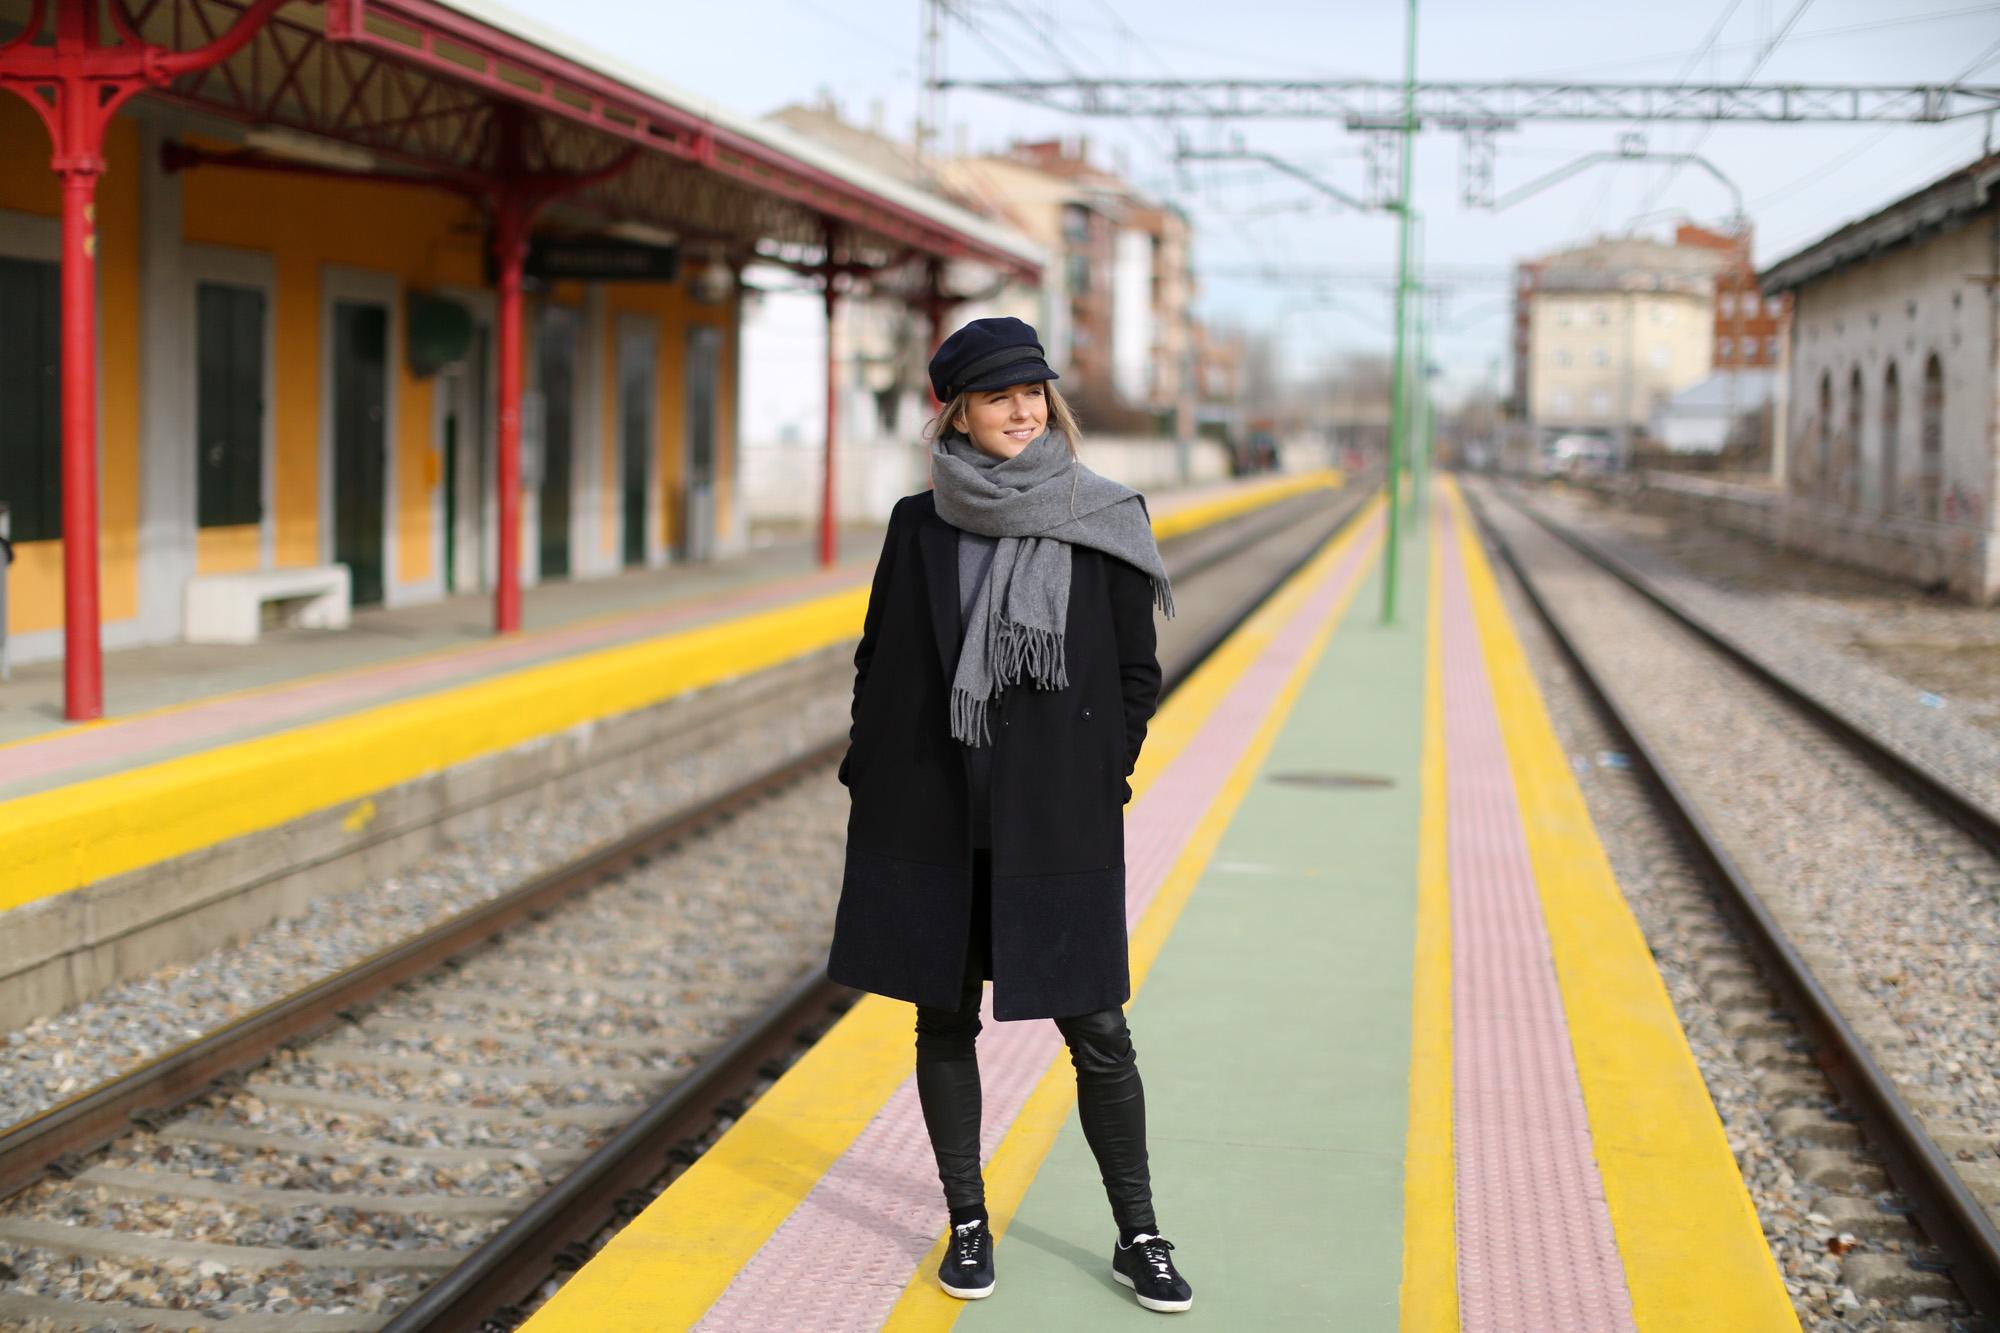 Clochet_streetstyle_cos_coat_saint_james_hat_adidas_gazelle-1-18